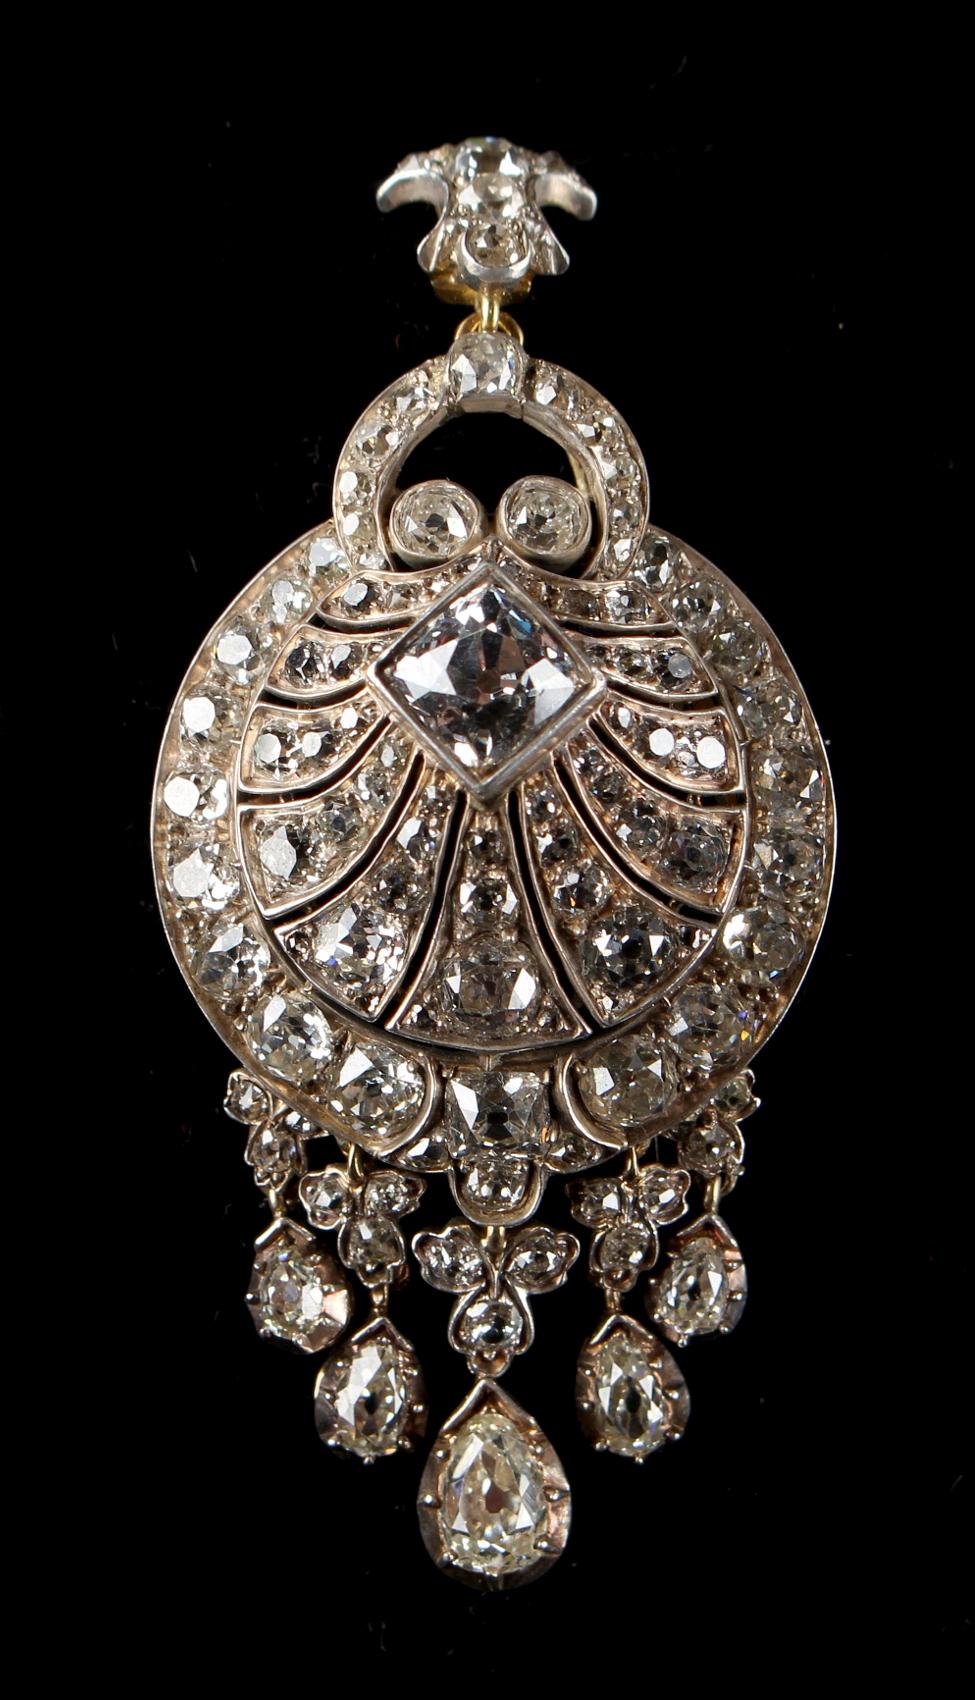 Lot 248 - A very good Georgian diamond tasselled pendant or brooch, the estimated total diamond weight 13.0